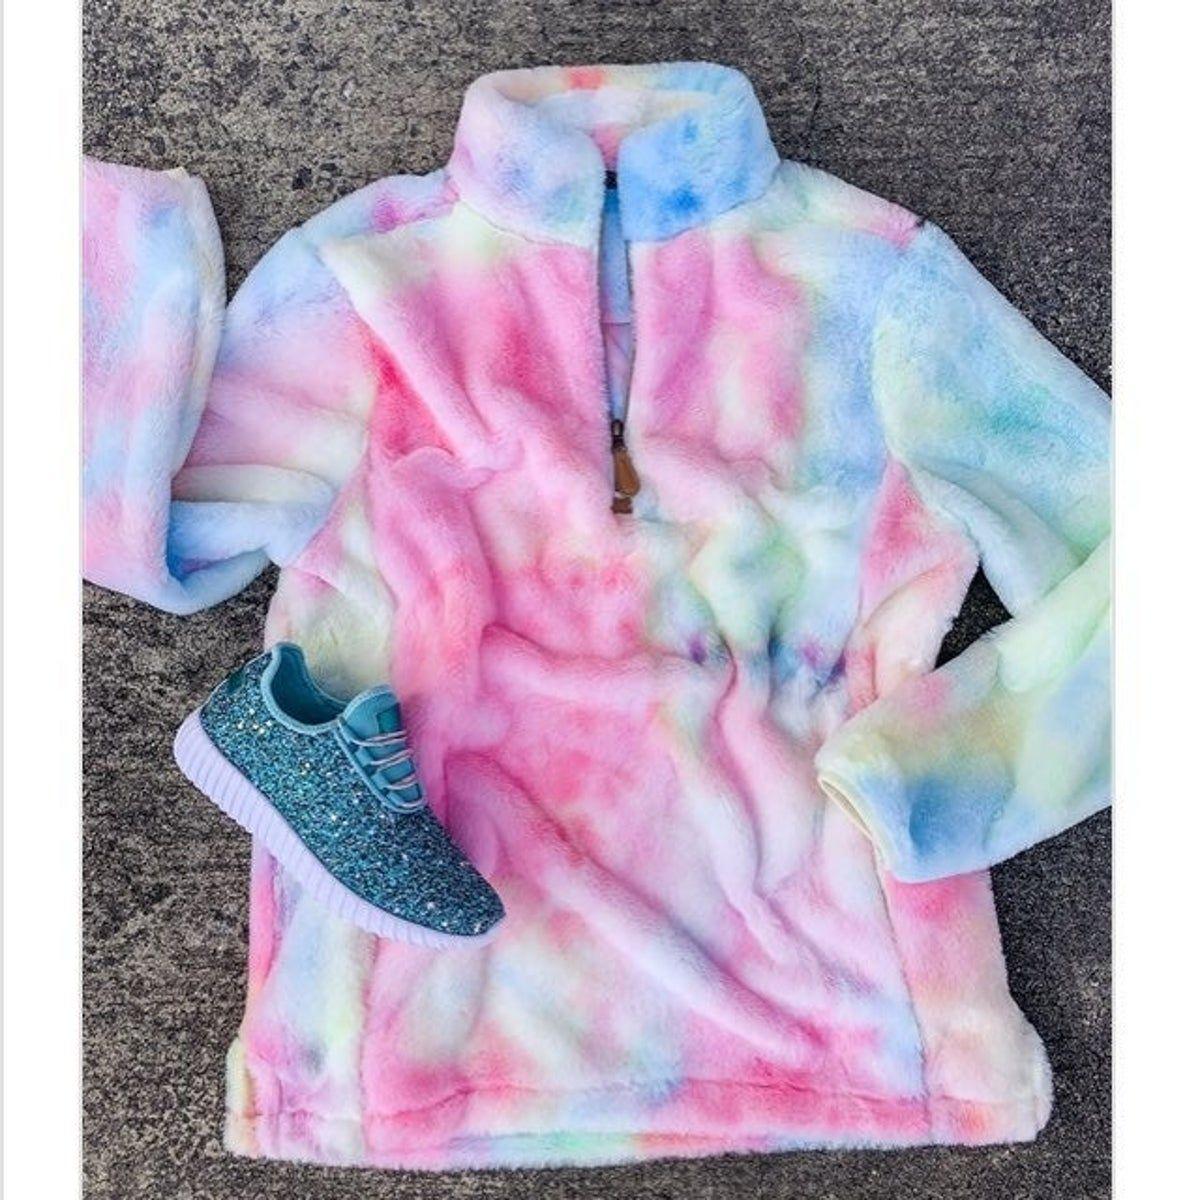 Tie Dye Sherpa Small Pullover Sweater Roupas Tumblr Roupas Perfeitas Moletons Femininos [ 1200 x 1200 Pixel ]